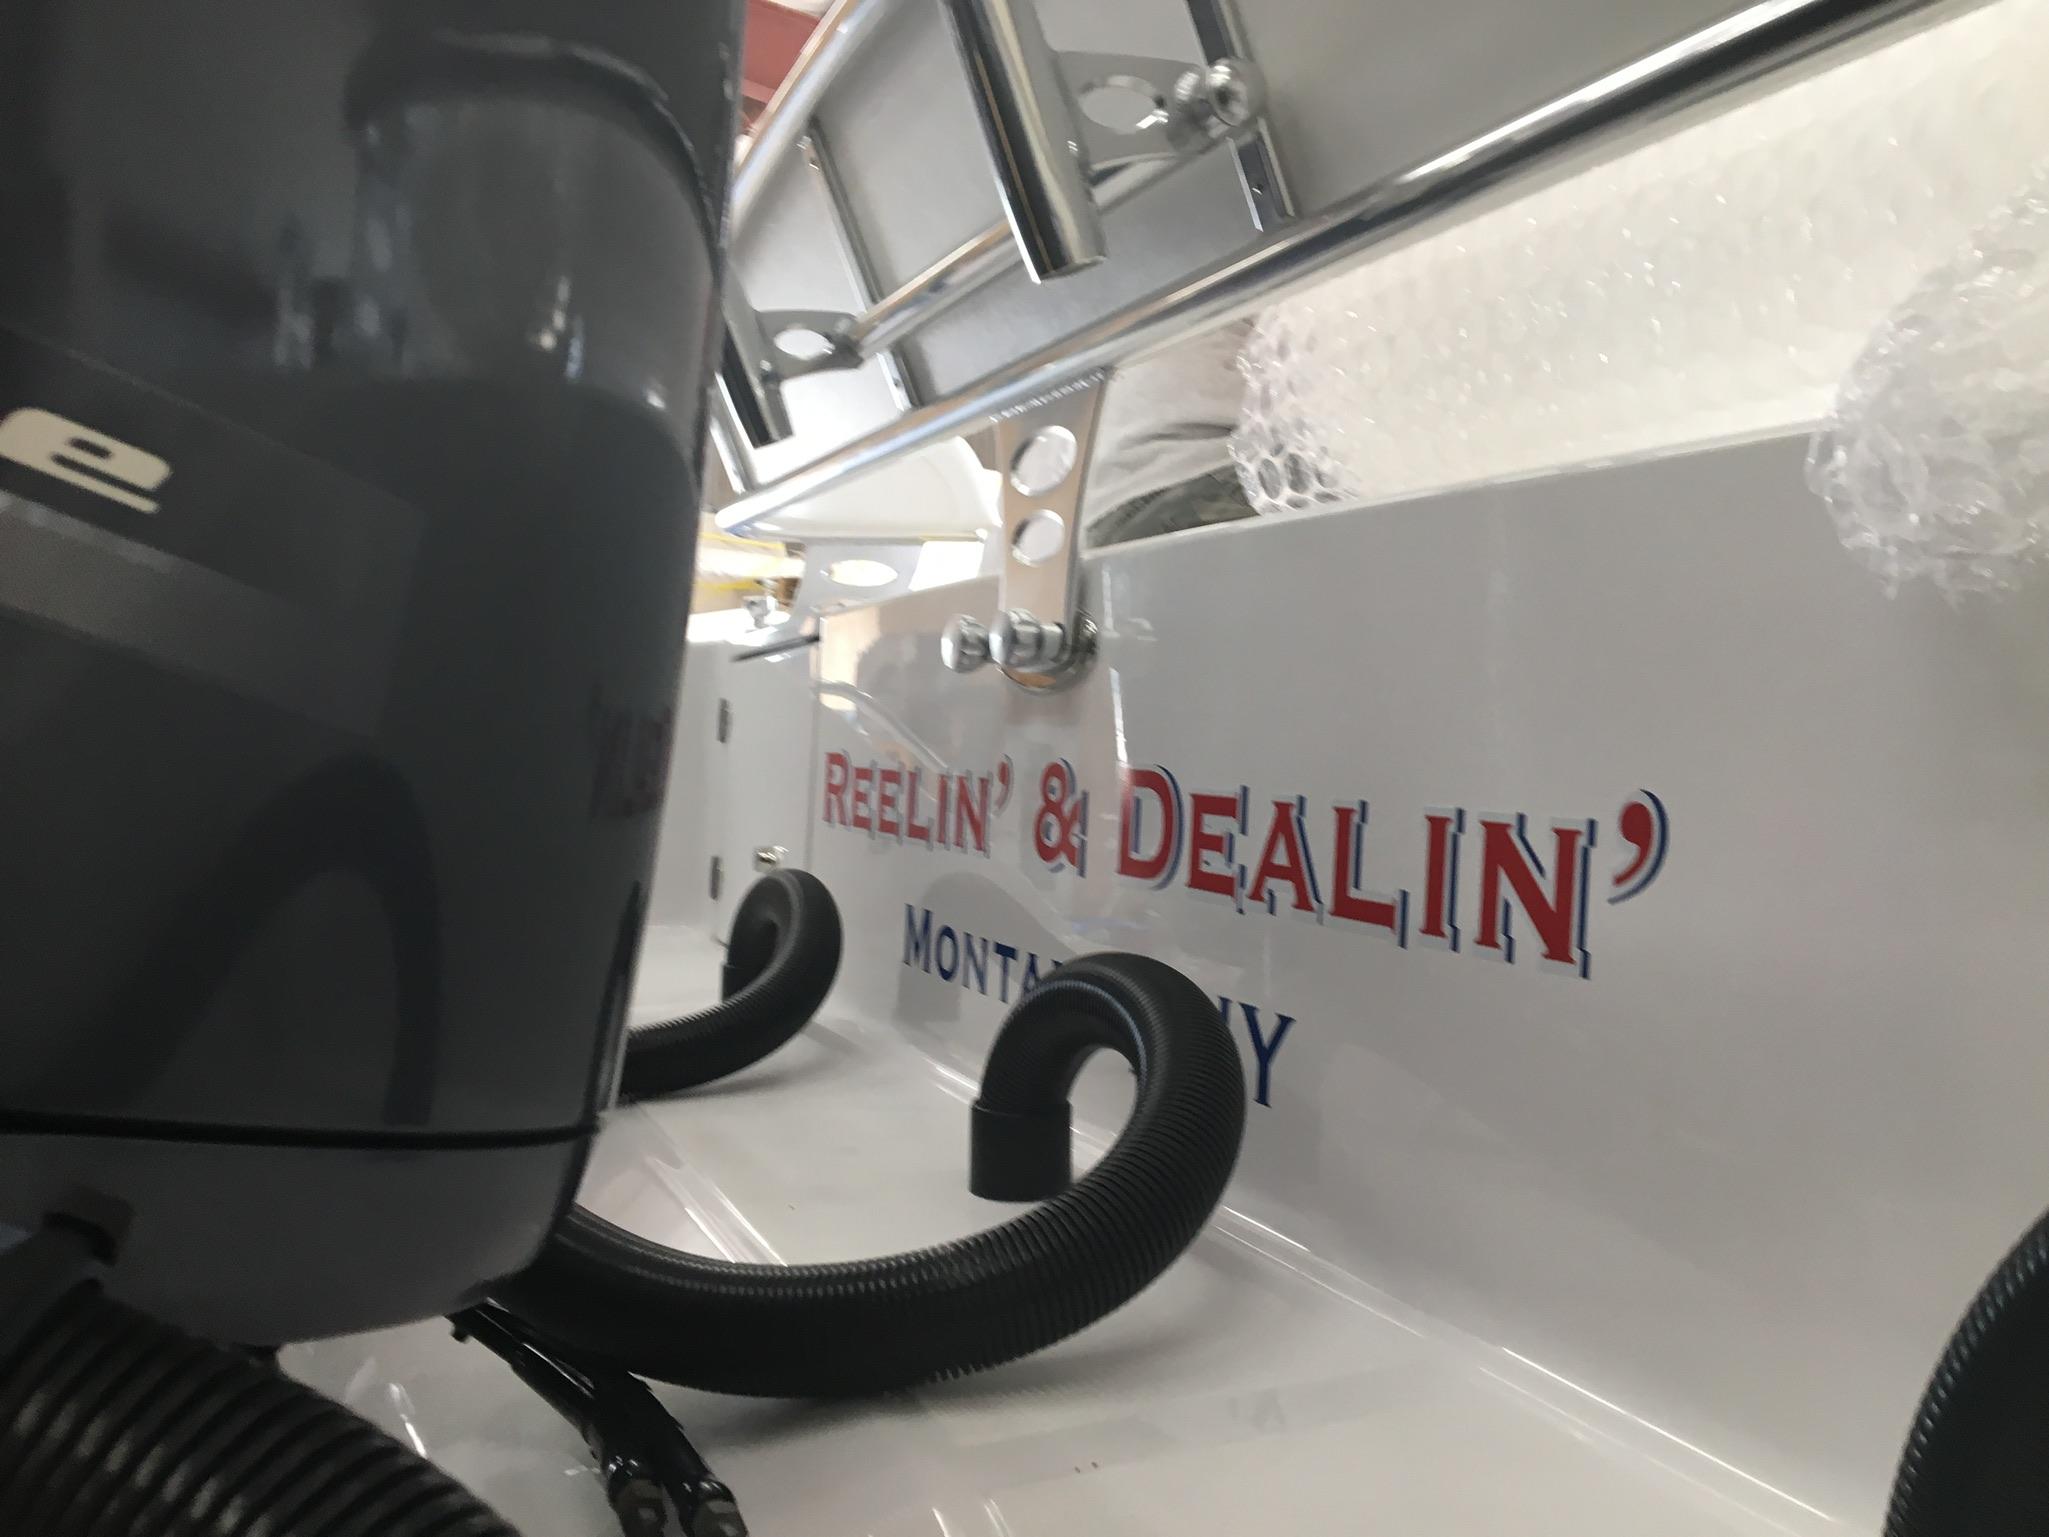 Reelin & Dealin